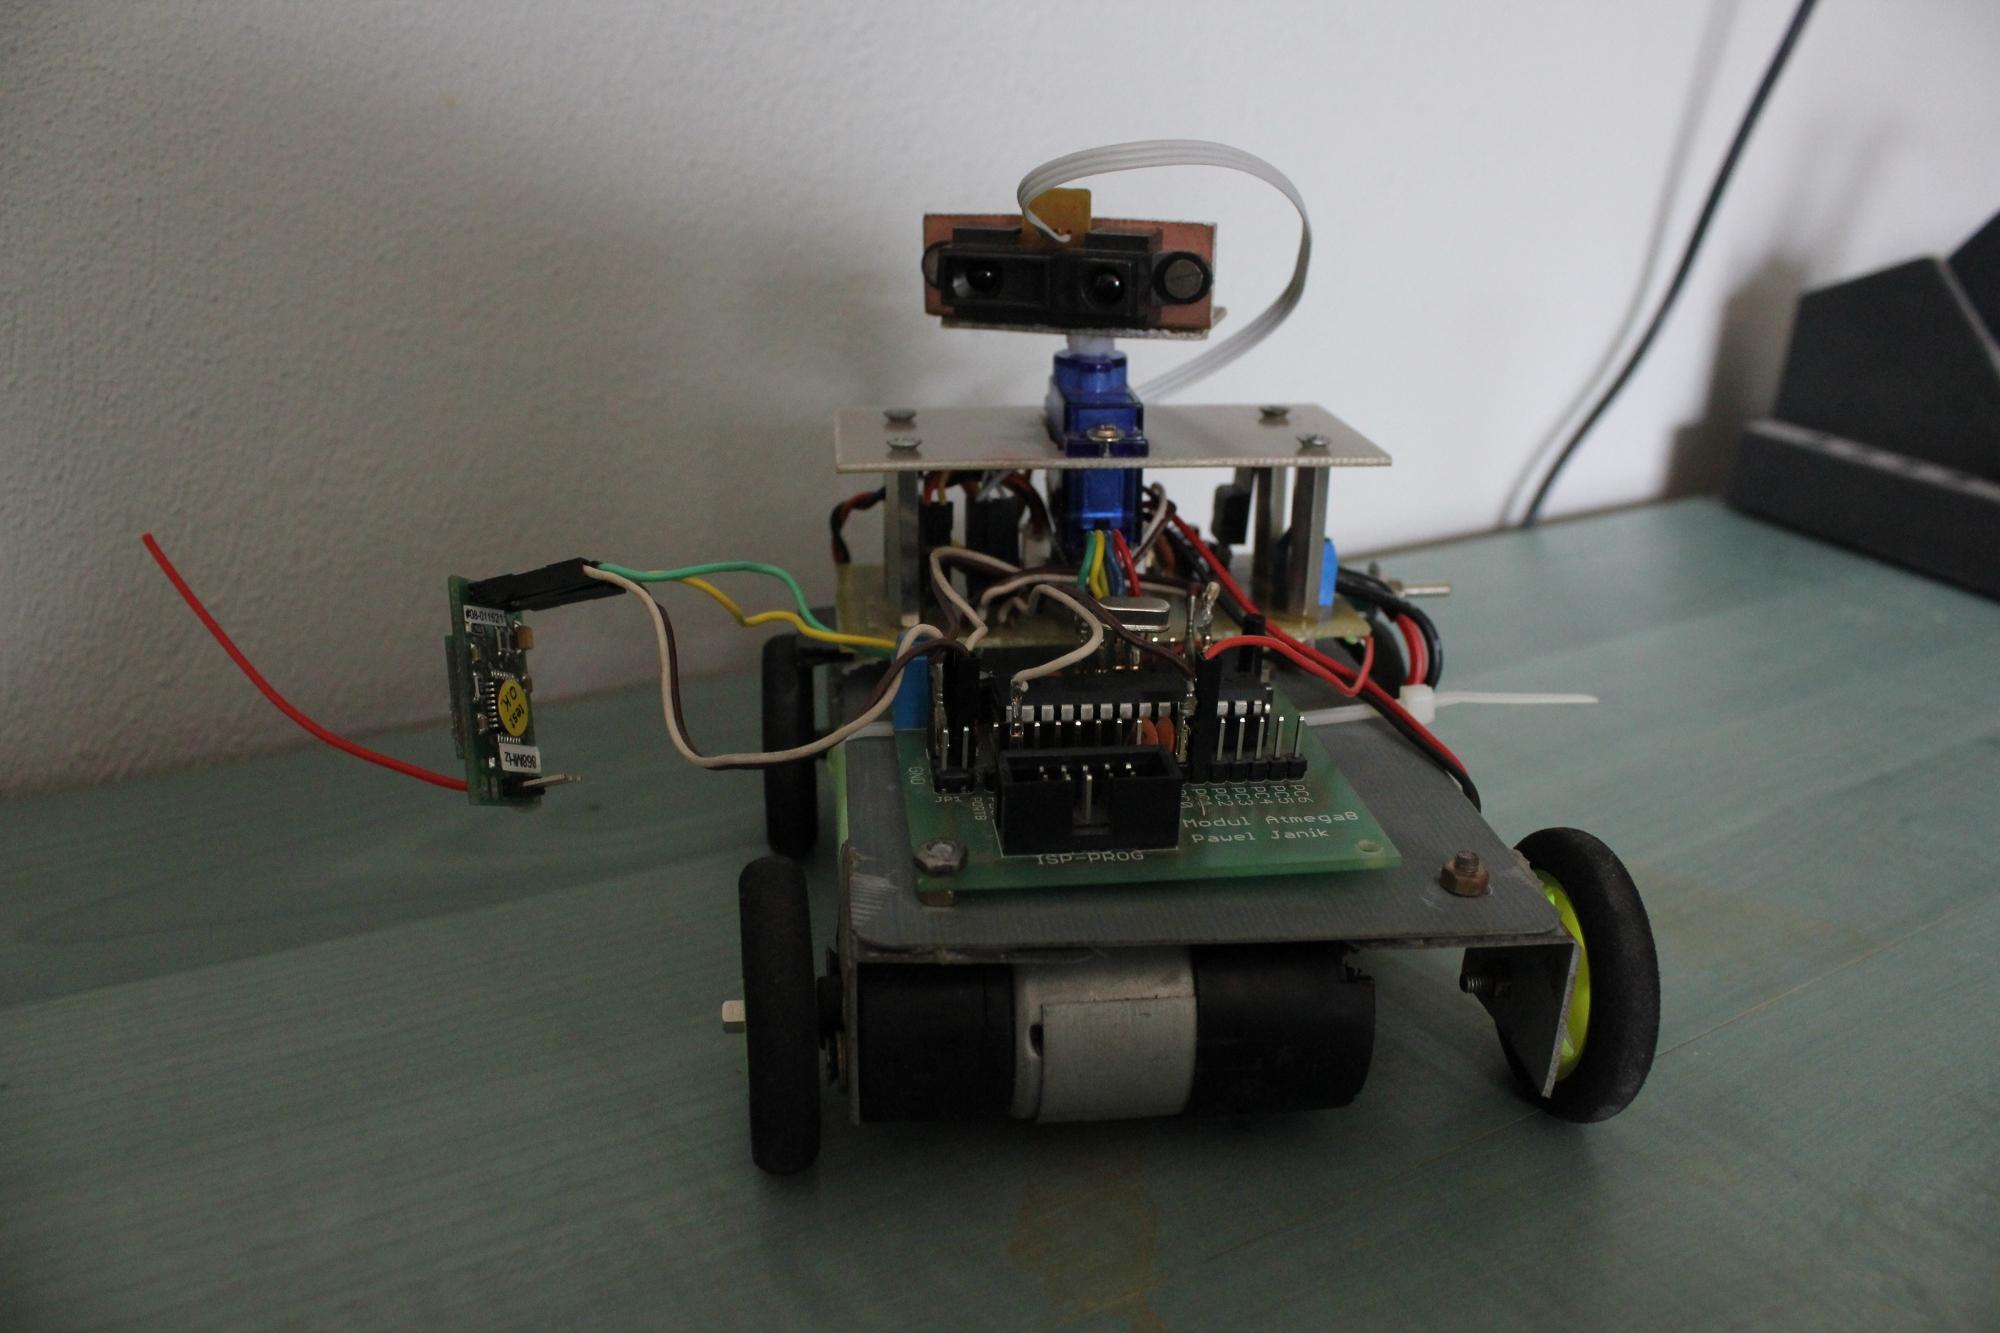 Robot EV - 00 - ma�a zabawka edukacyjna